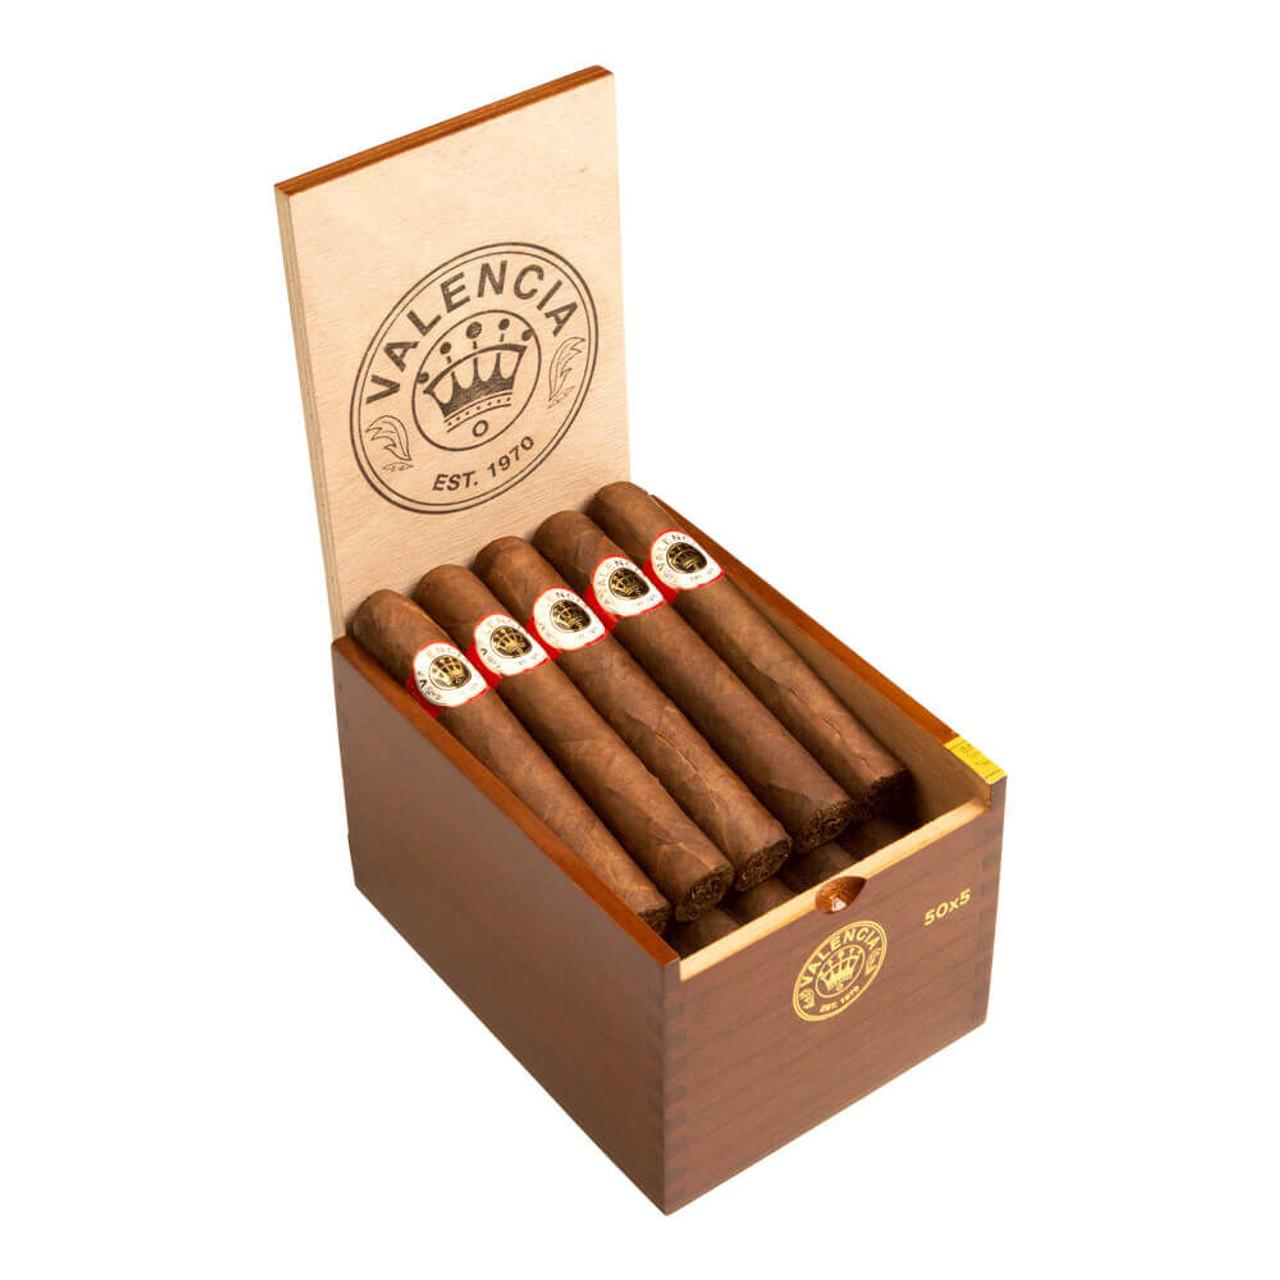 Valencia Sun Grown Robusto Cigars - 5 x 50 (Box of 20)